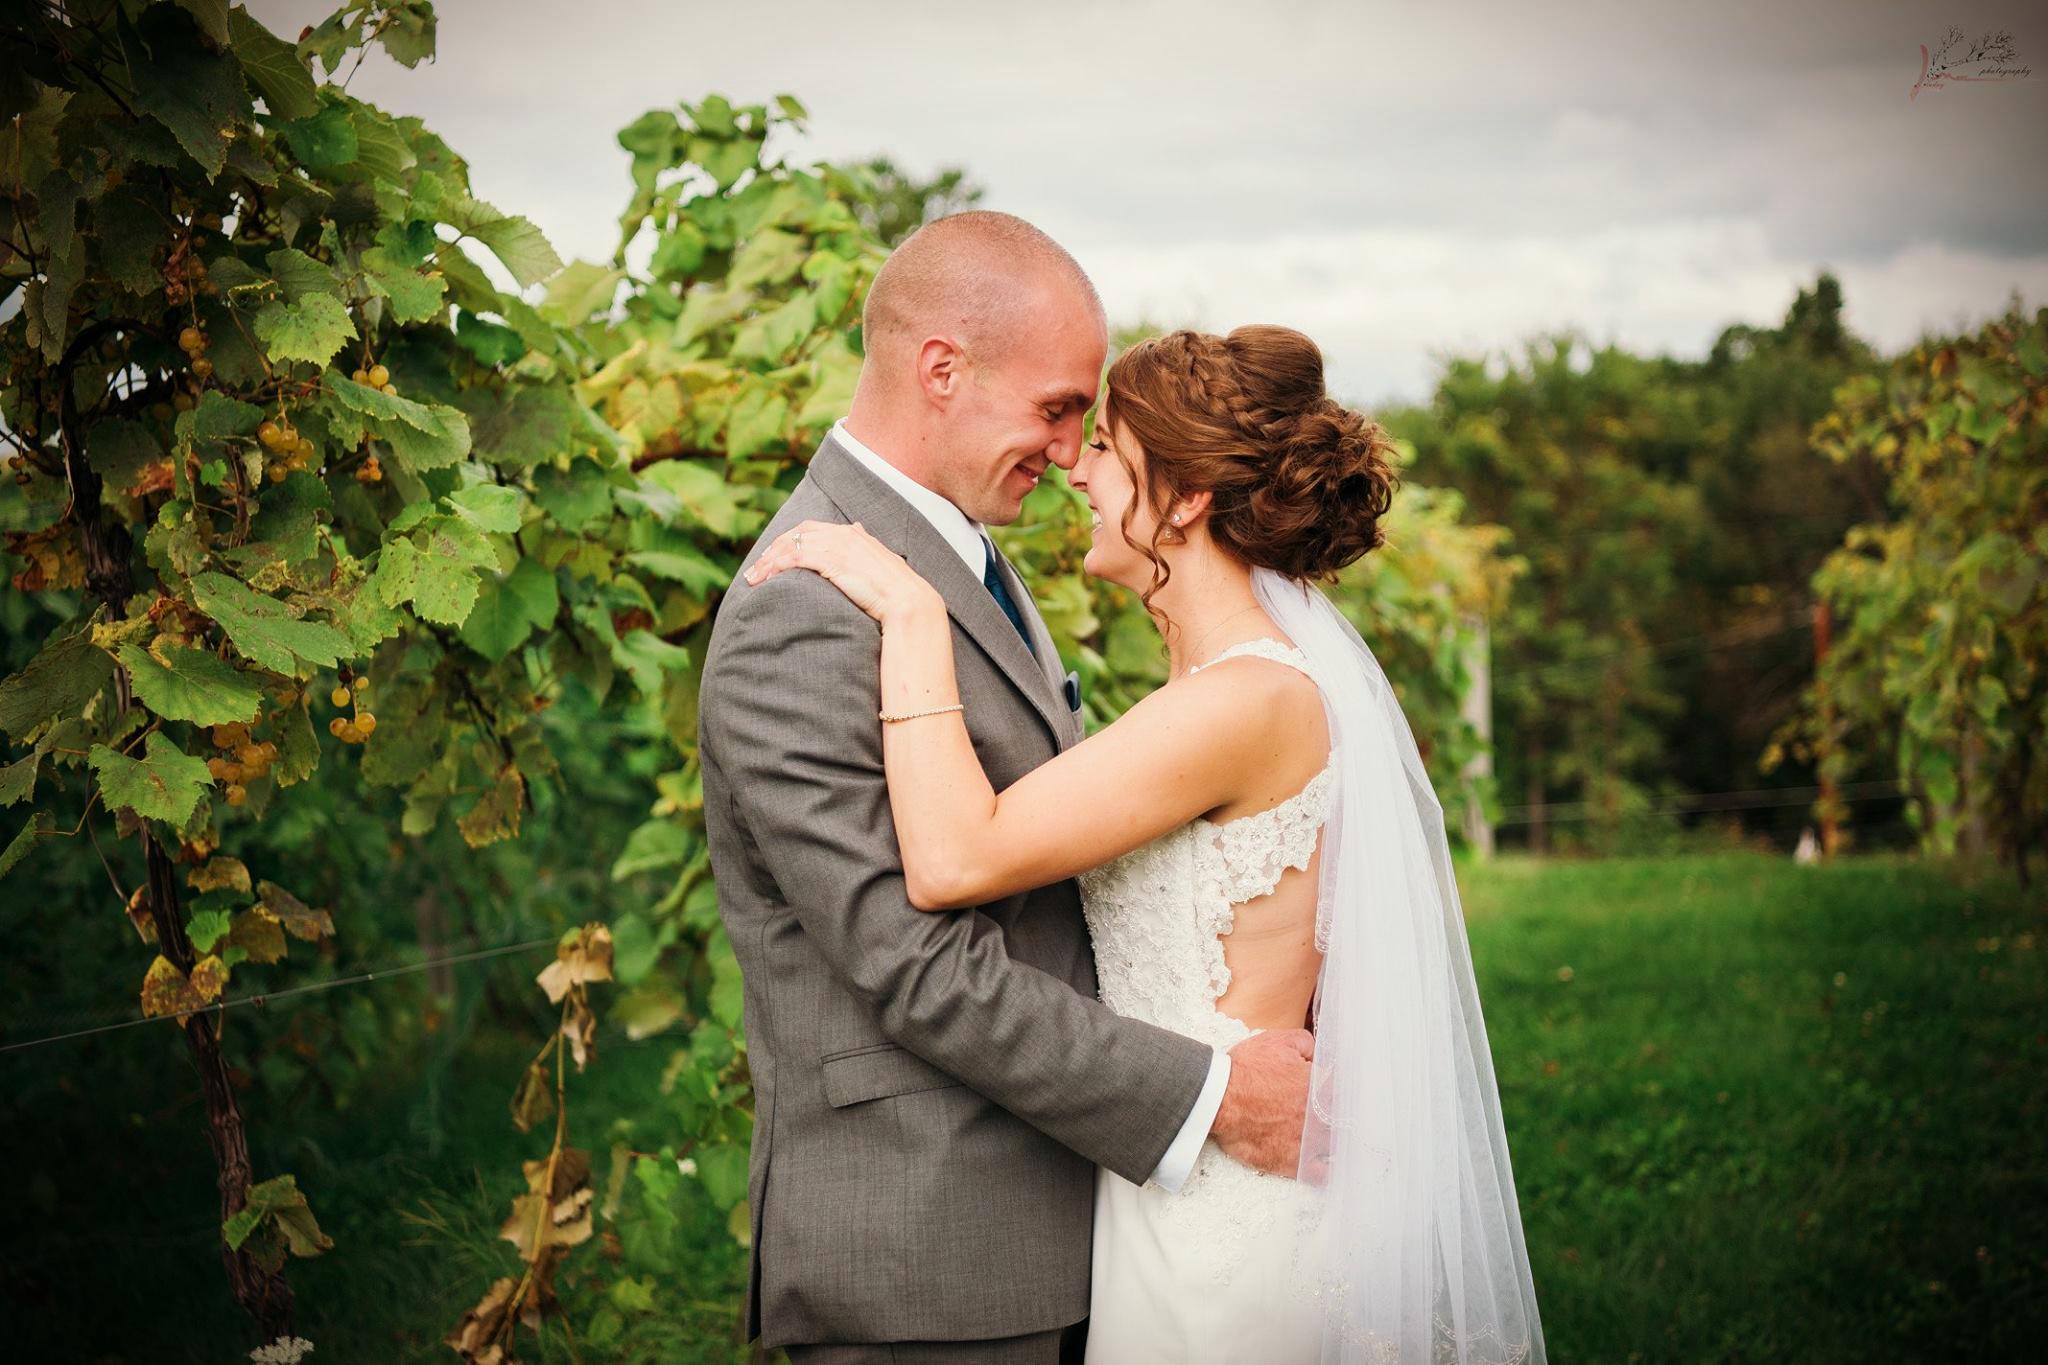 wedding vineyard BG9.30.17.jpg